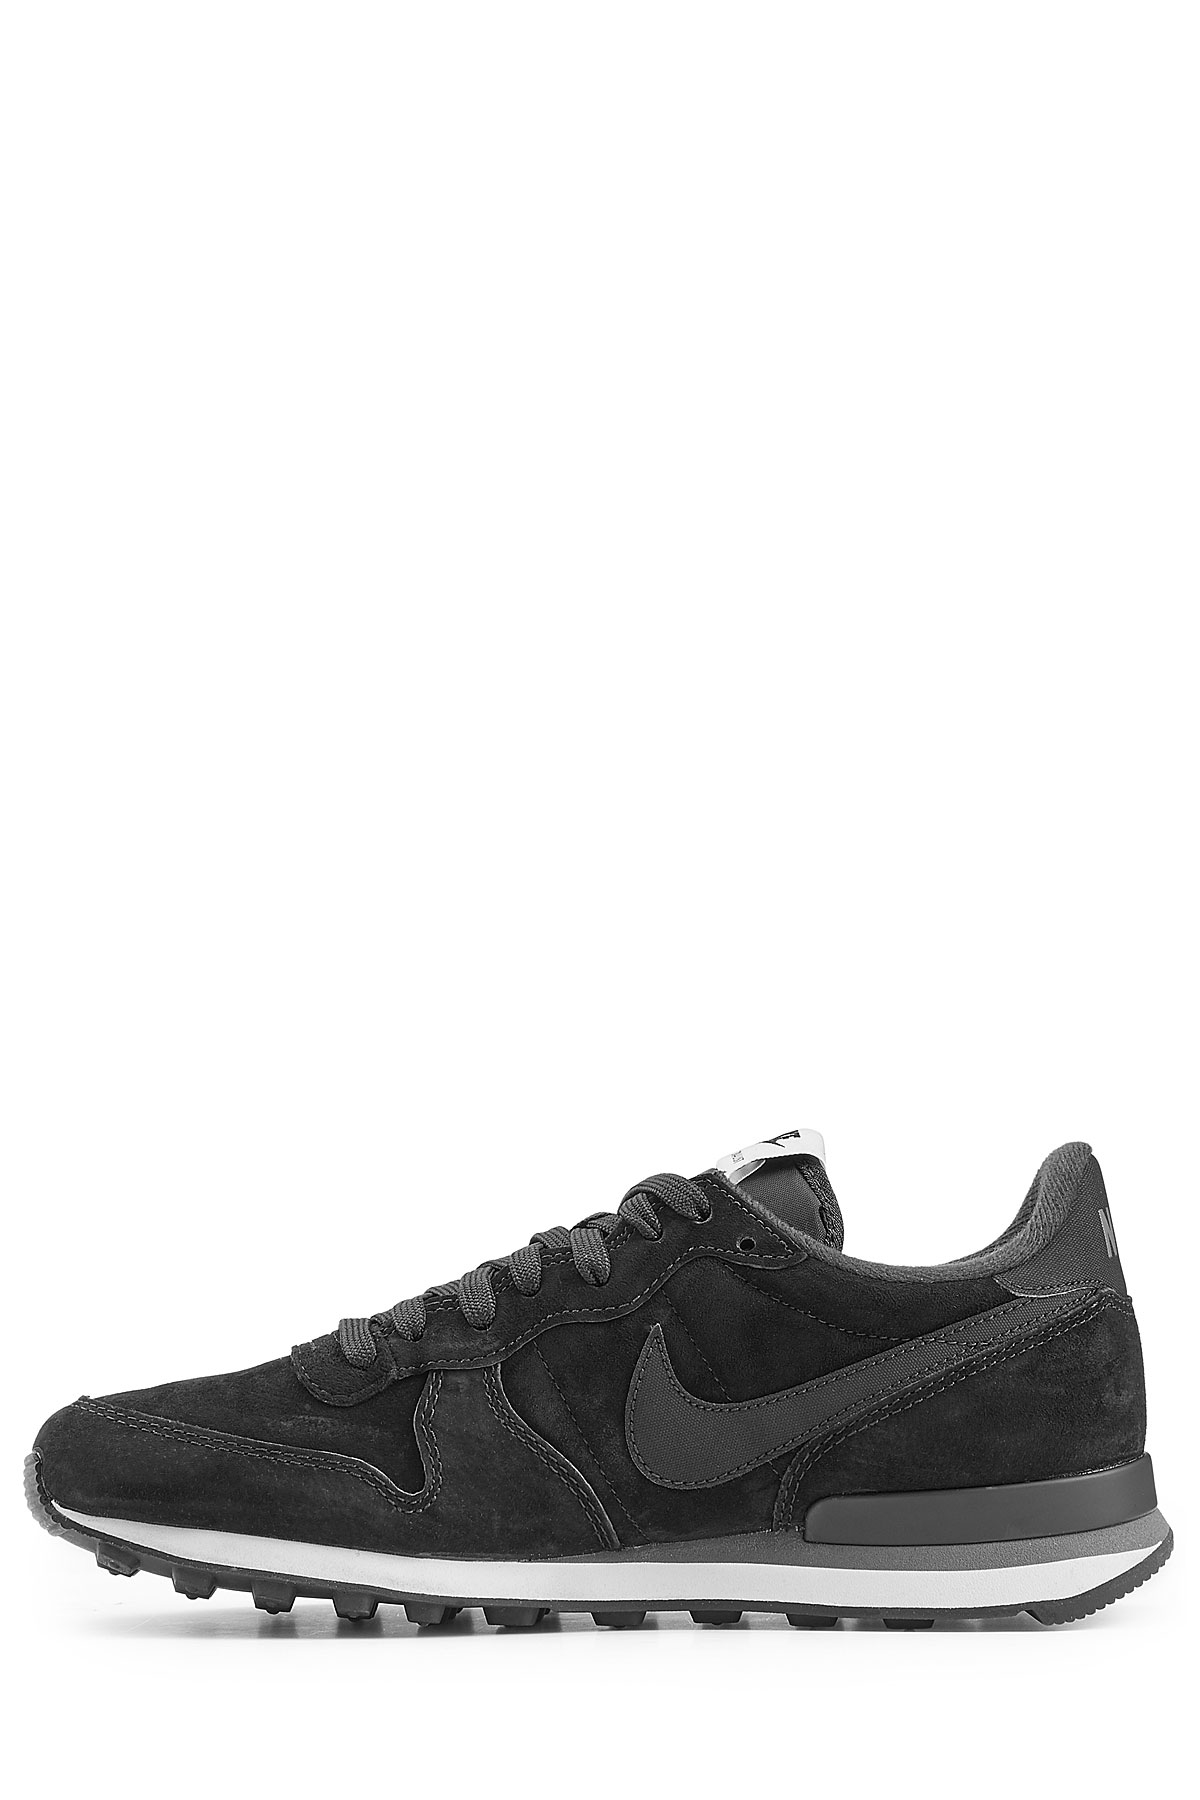 new product b316a ec466 Nike Internationalist Suede Sneakers - Black in Black for Men - Lyst